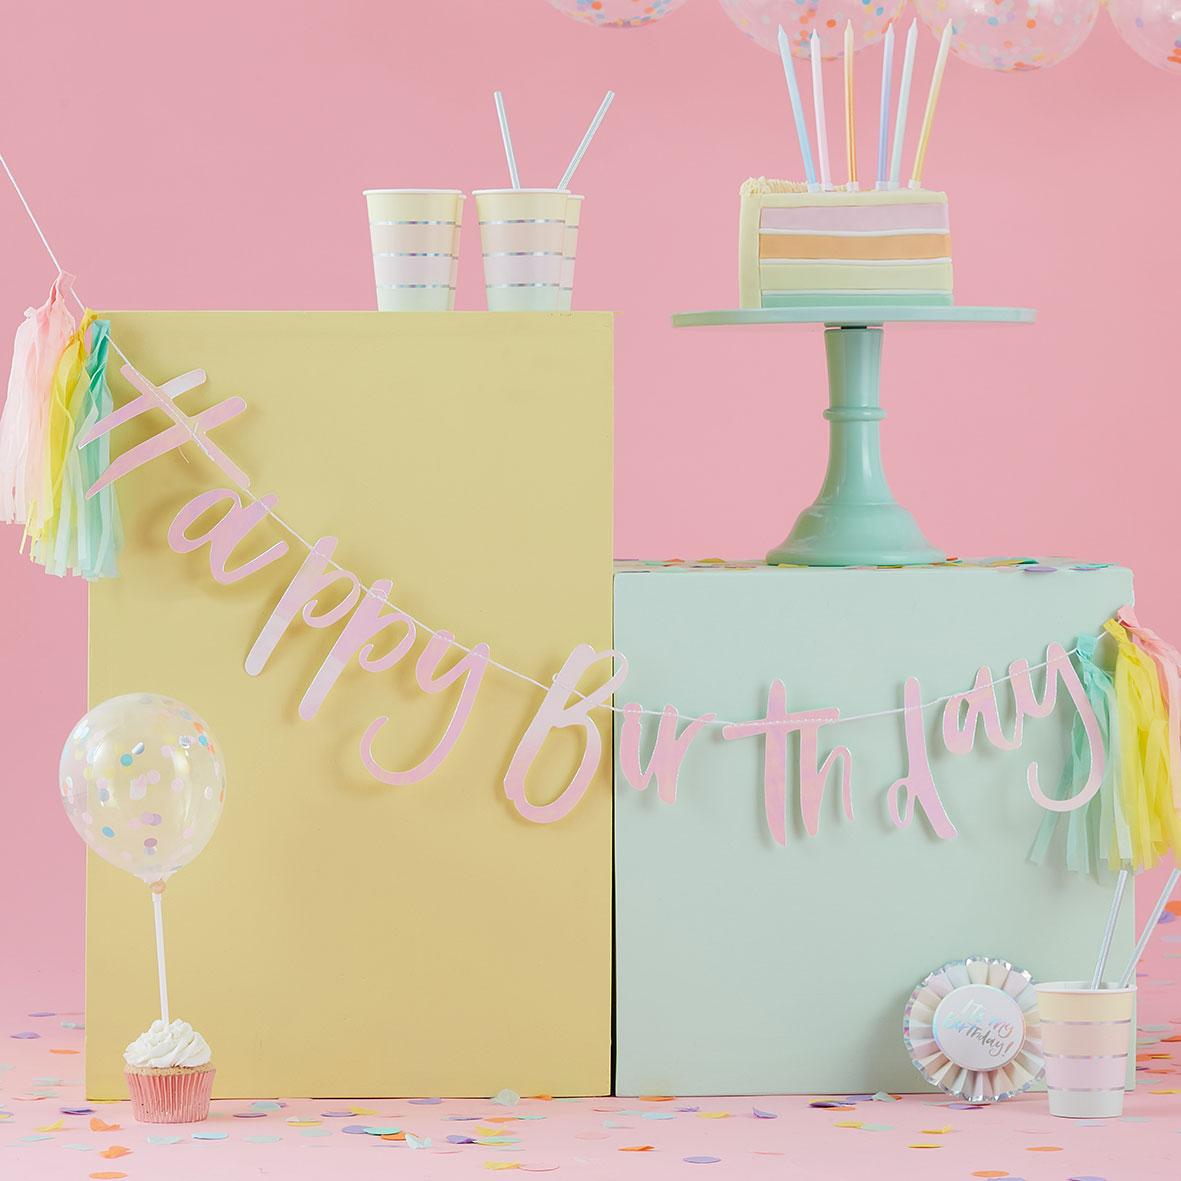 PS-513-Pearlescent-Happy-Birthday-Bunting.jpg